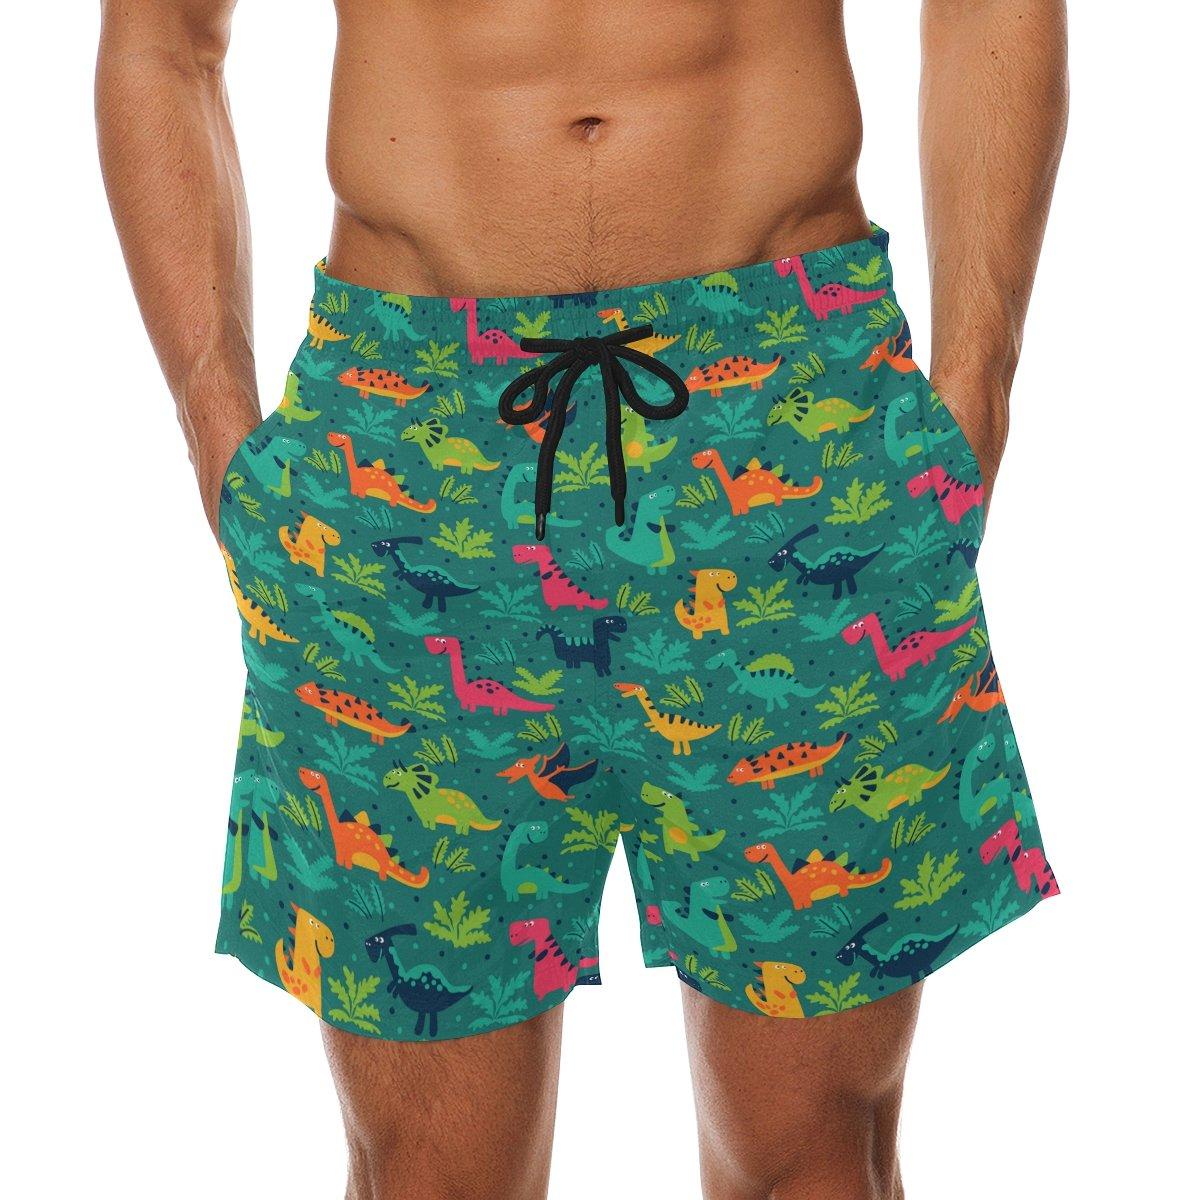 d3cdae983133c Franzibla Cute Cartoon Dinosaur Pattern Print Men's Swim Trunks Swimming  Beach Shorts Watershort | Amazon.com